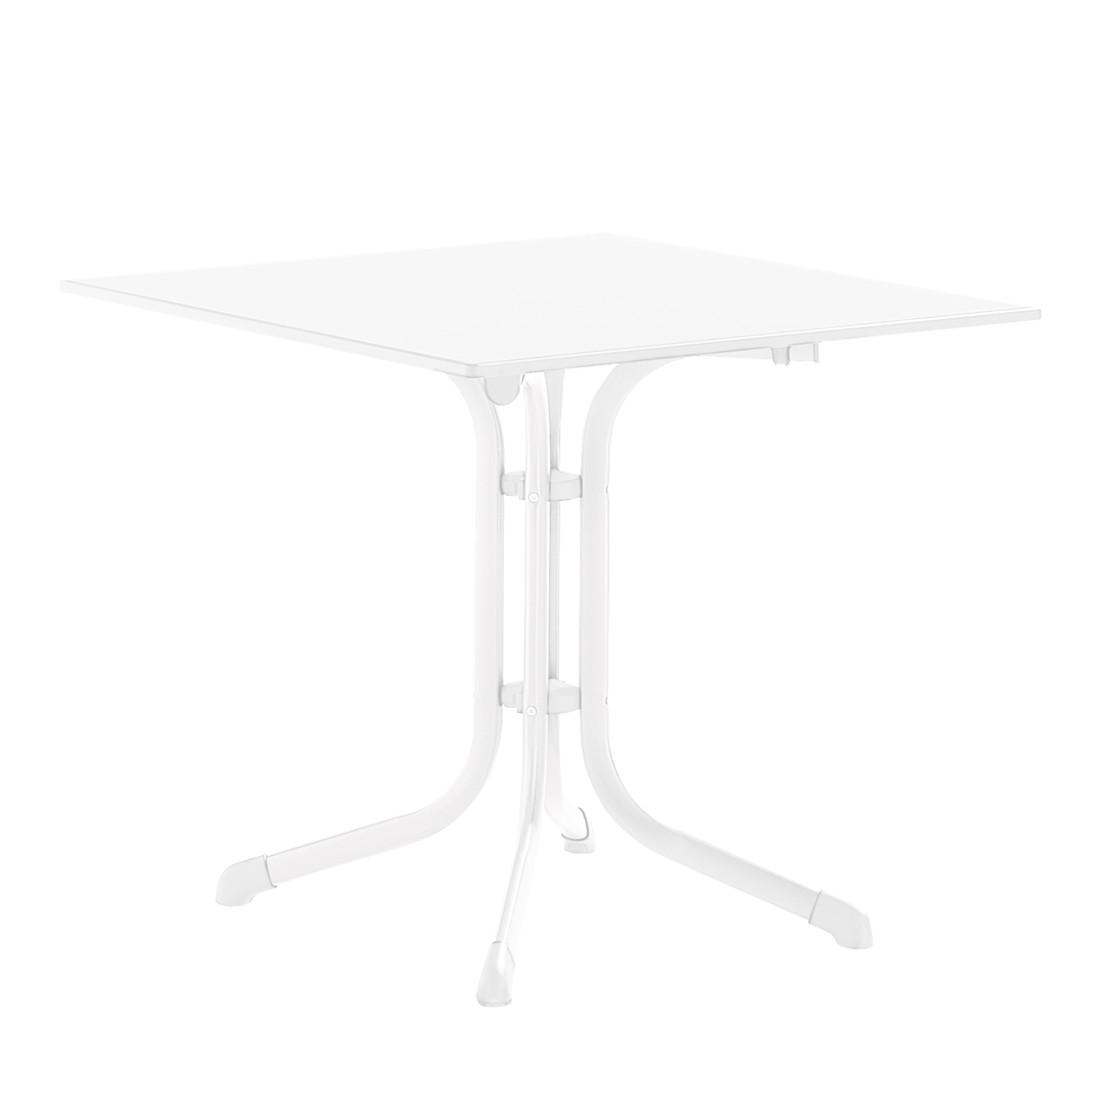 Klapptisch Houma II - Marmordekor/Weiß - 70 x 72 x 70 cm, Sieger